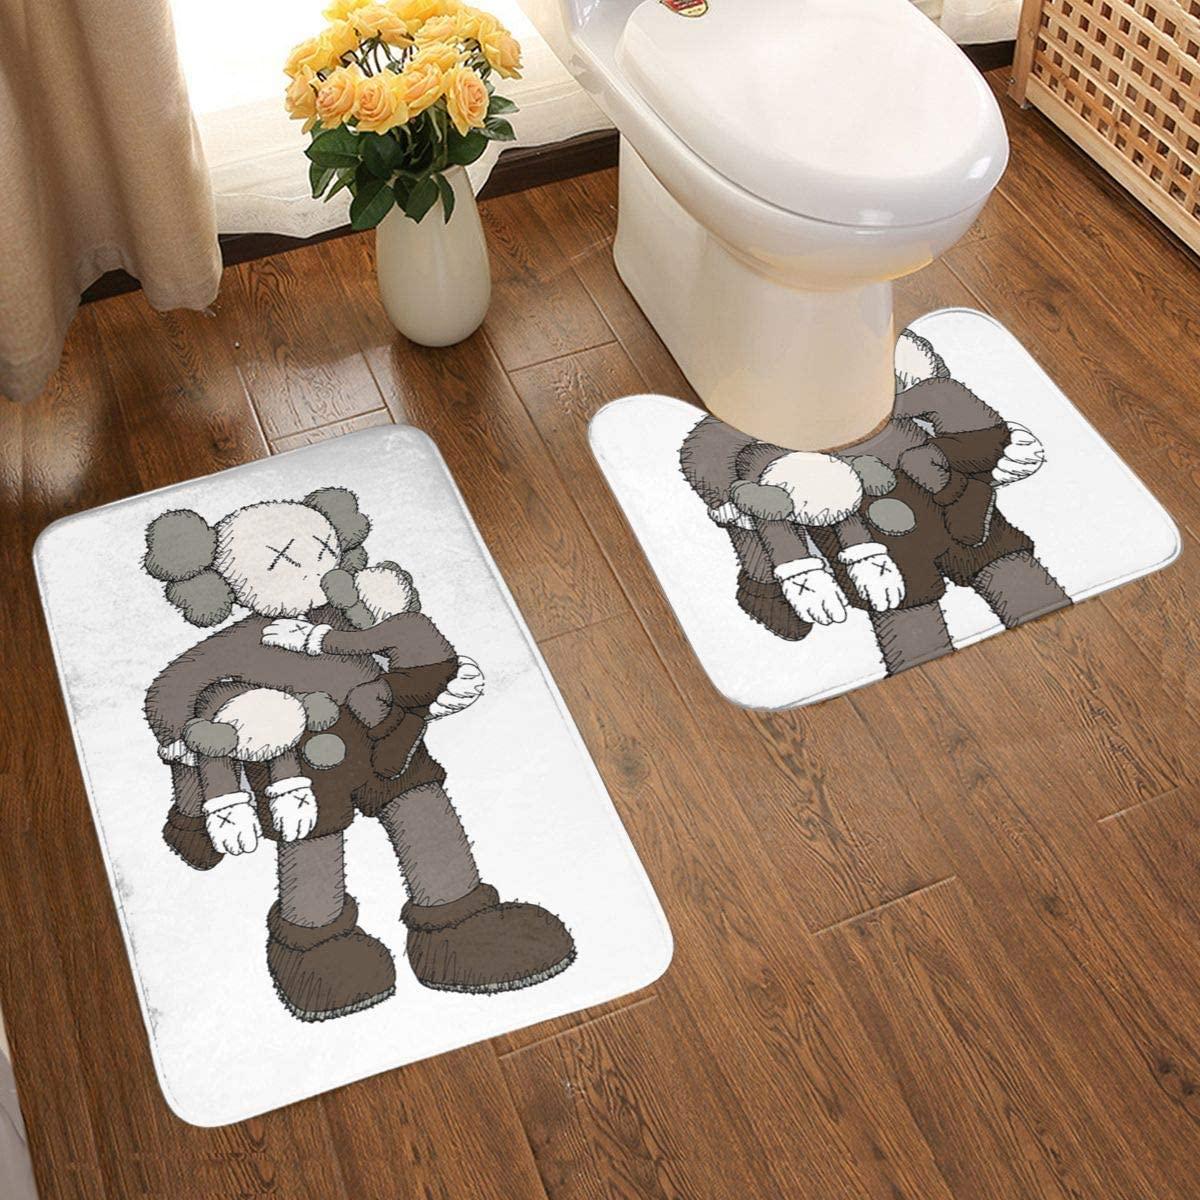 KAWS Bathroom Rugs Bath Mat Set for Bathroom 2 Piece 19 X 15 U Shape Contour Bath Rug & 31 X 19 Bathroom Rug Mats Toilet Machine Wash Non Slip